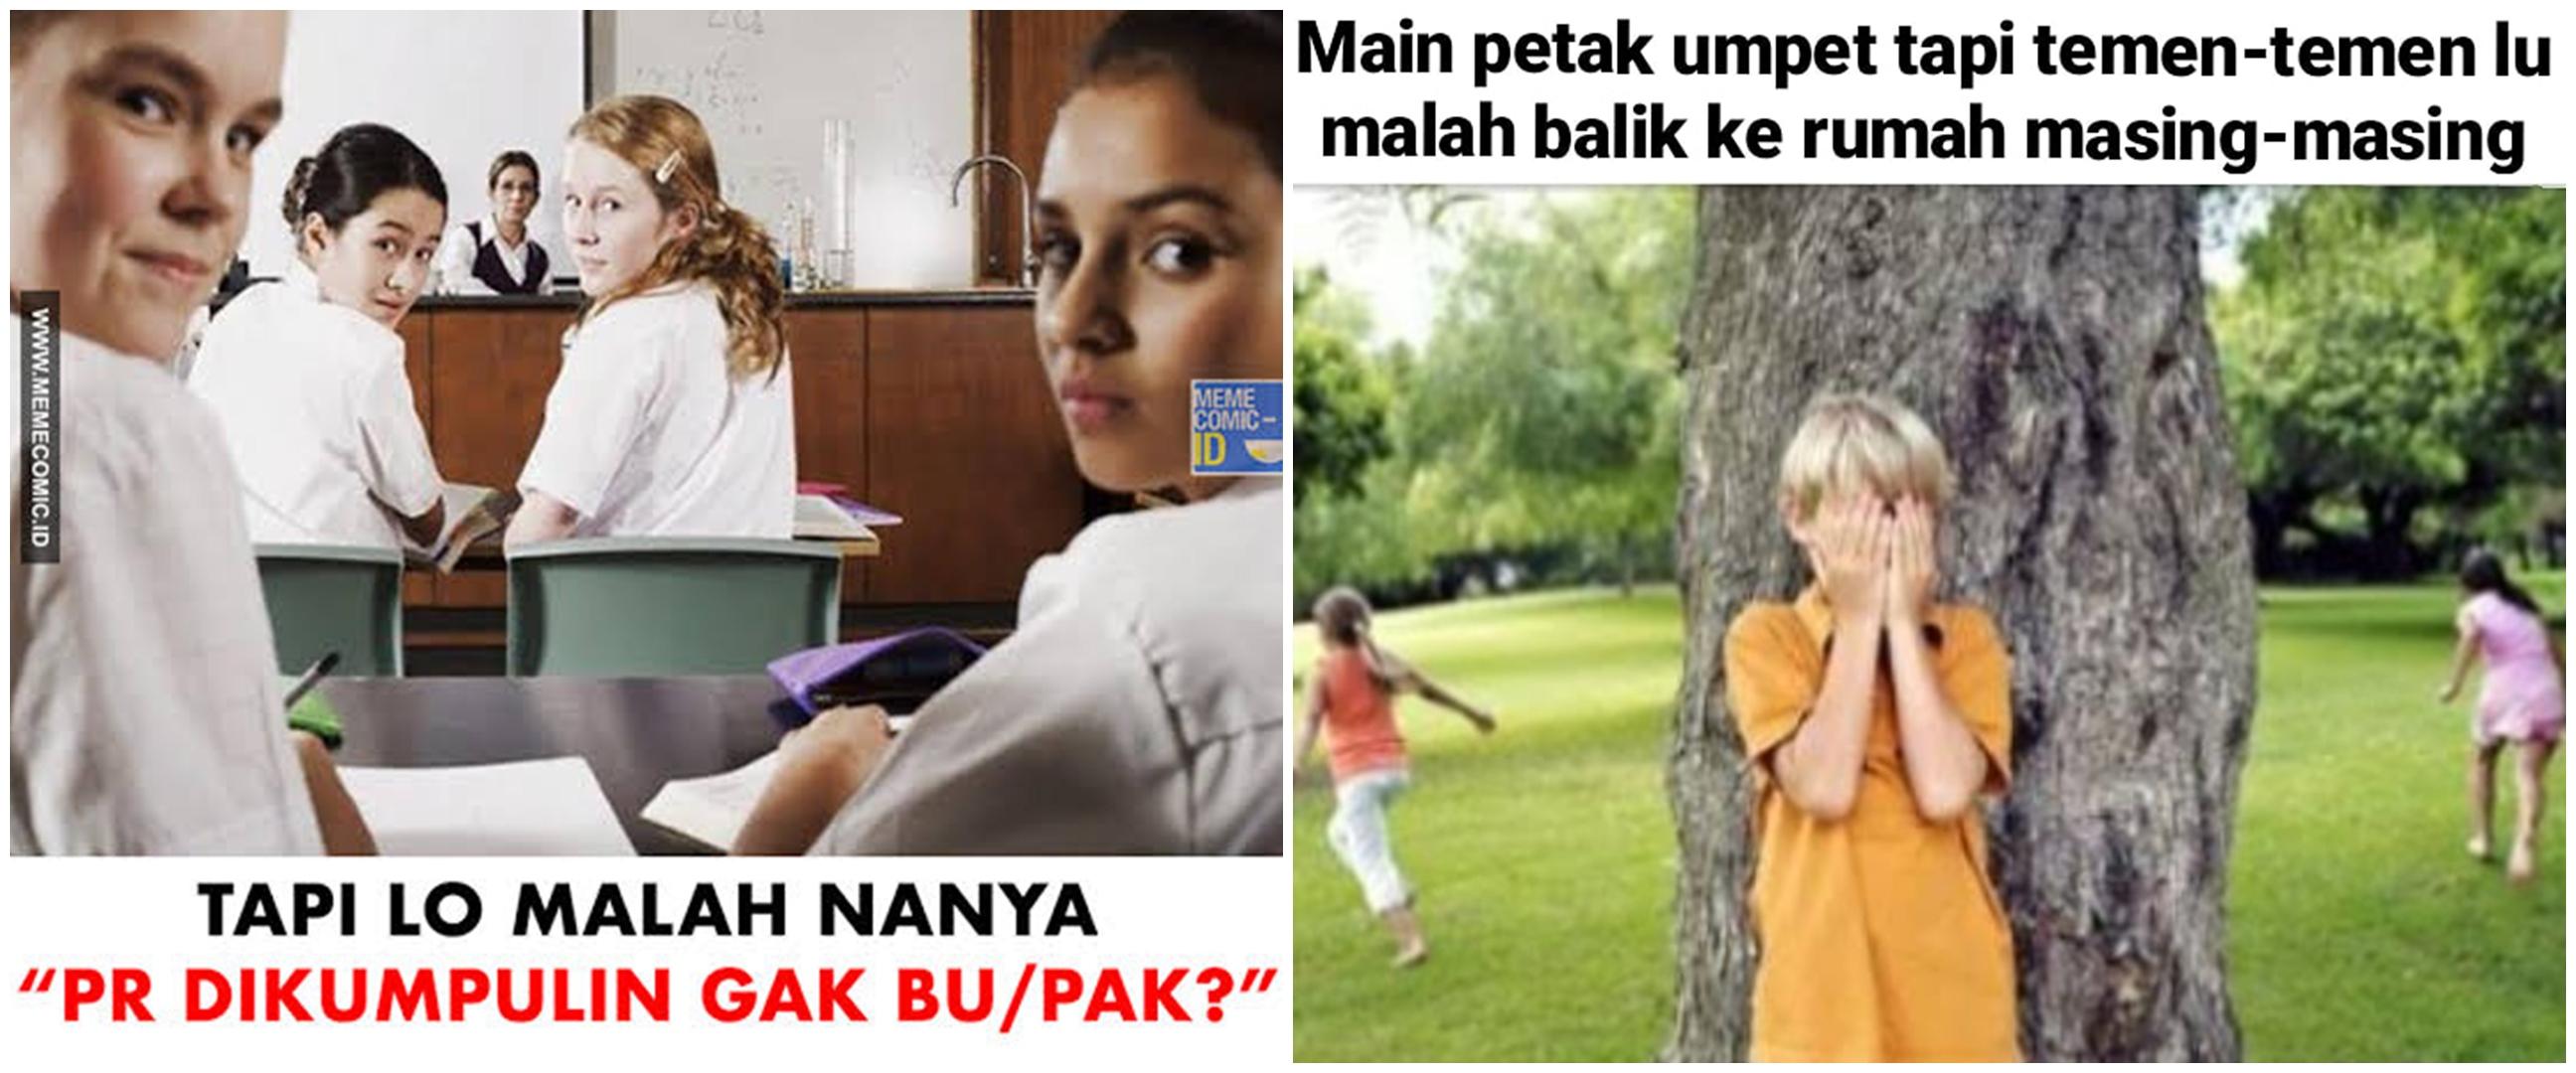 10 Meme lucu momen ngeselin semasa kecil, bikin geregetan